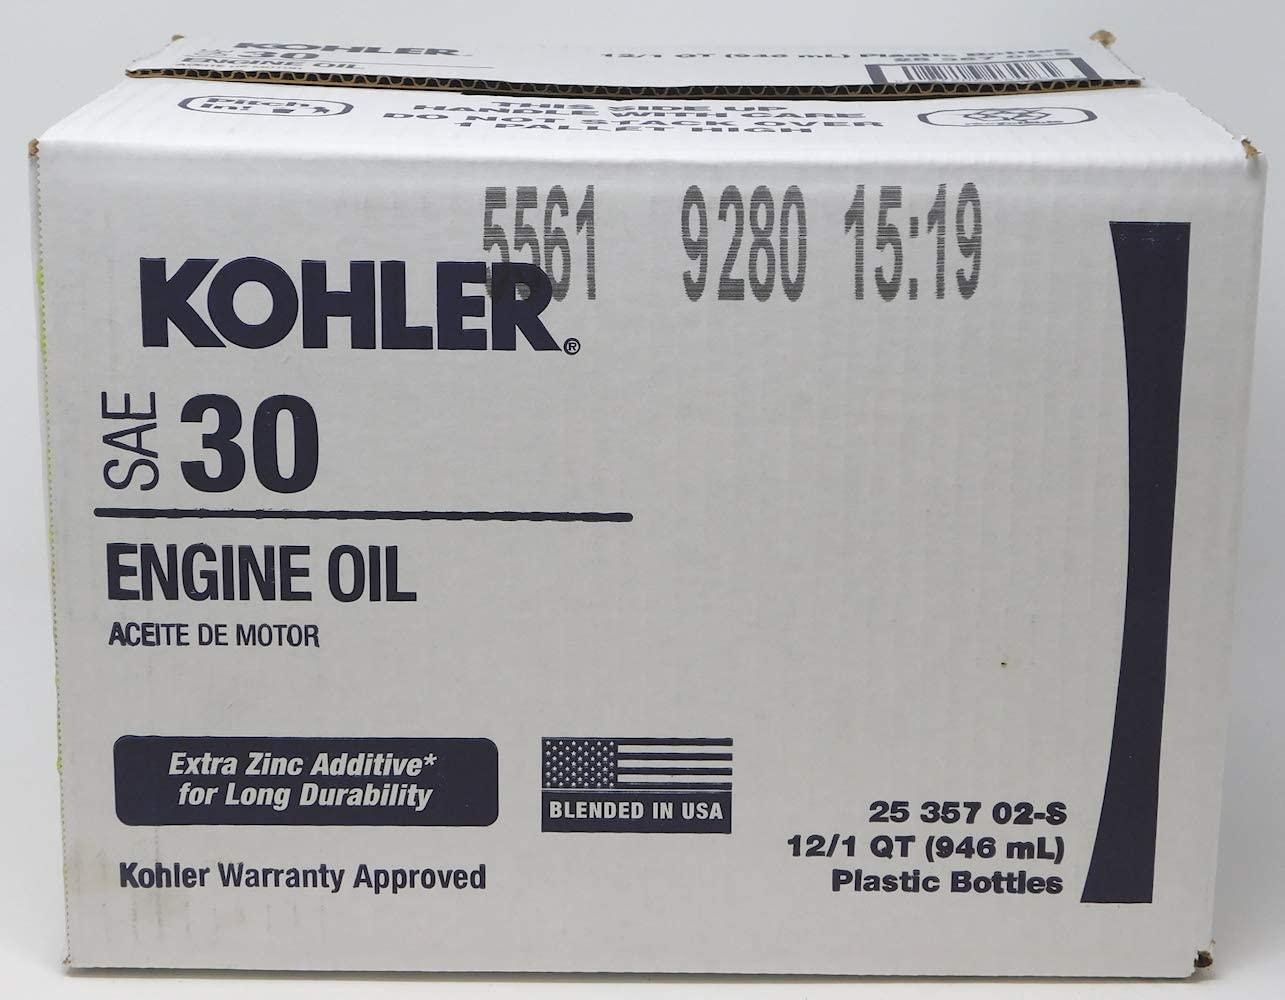 Kohler Case of Oil - Magnum 25 357 02-S